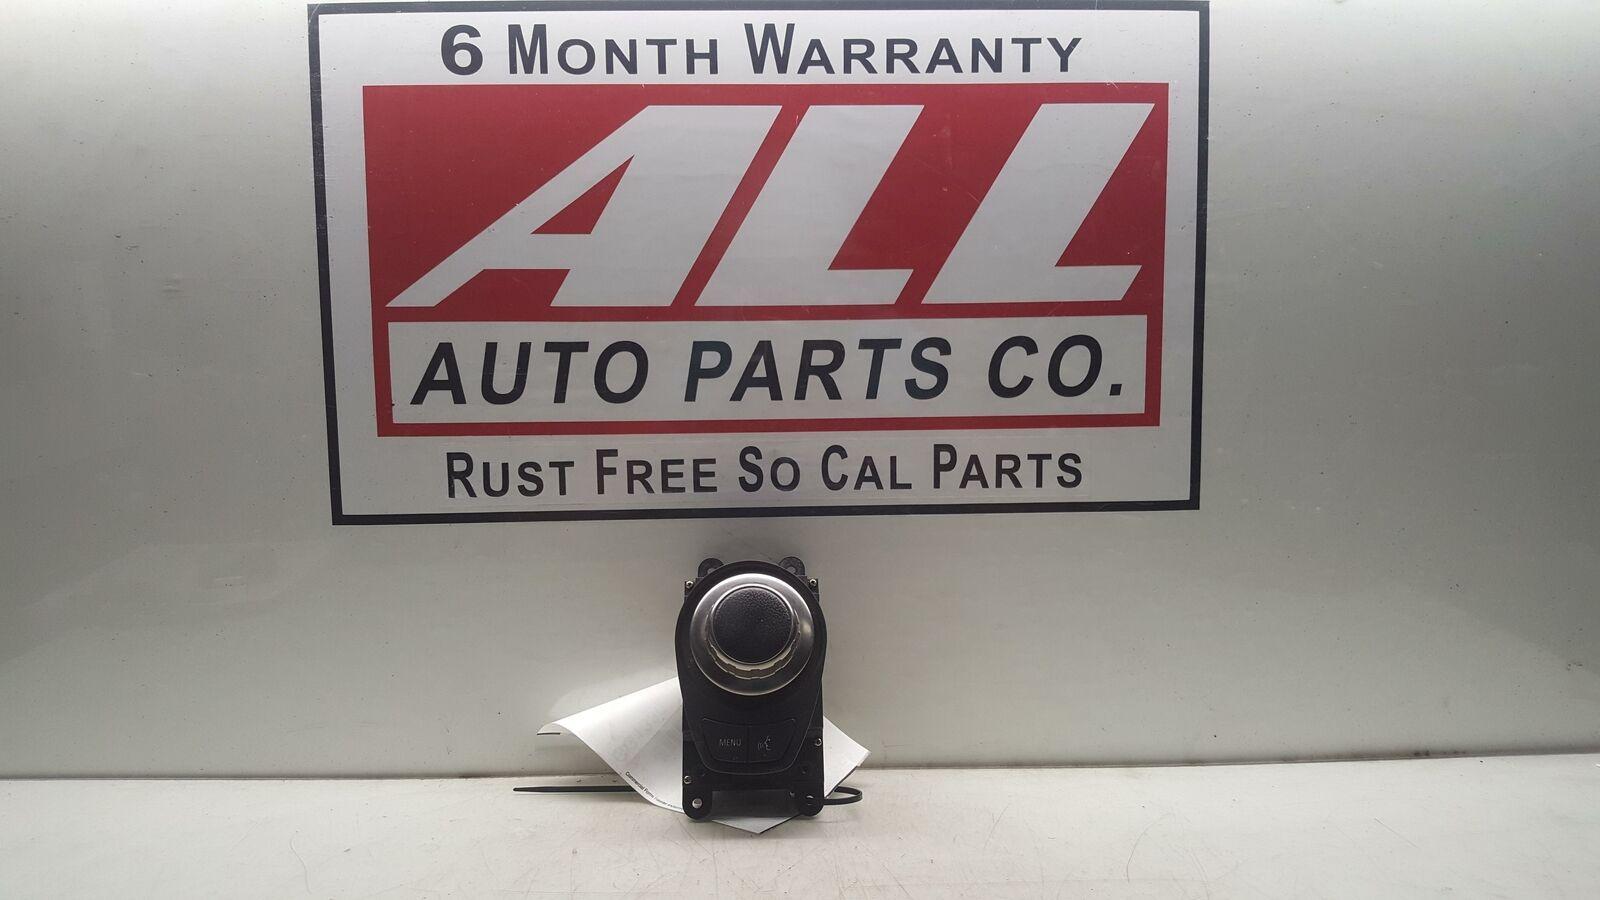 Lunsom Metal Shift Handle Head Manual 5 Speed Car Aluminium Alloy Gear Shifter Lever Stick Knob Fit Universal Auto Transmission Vehicle Black